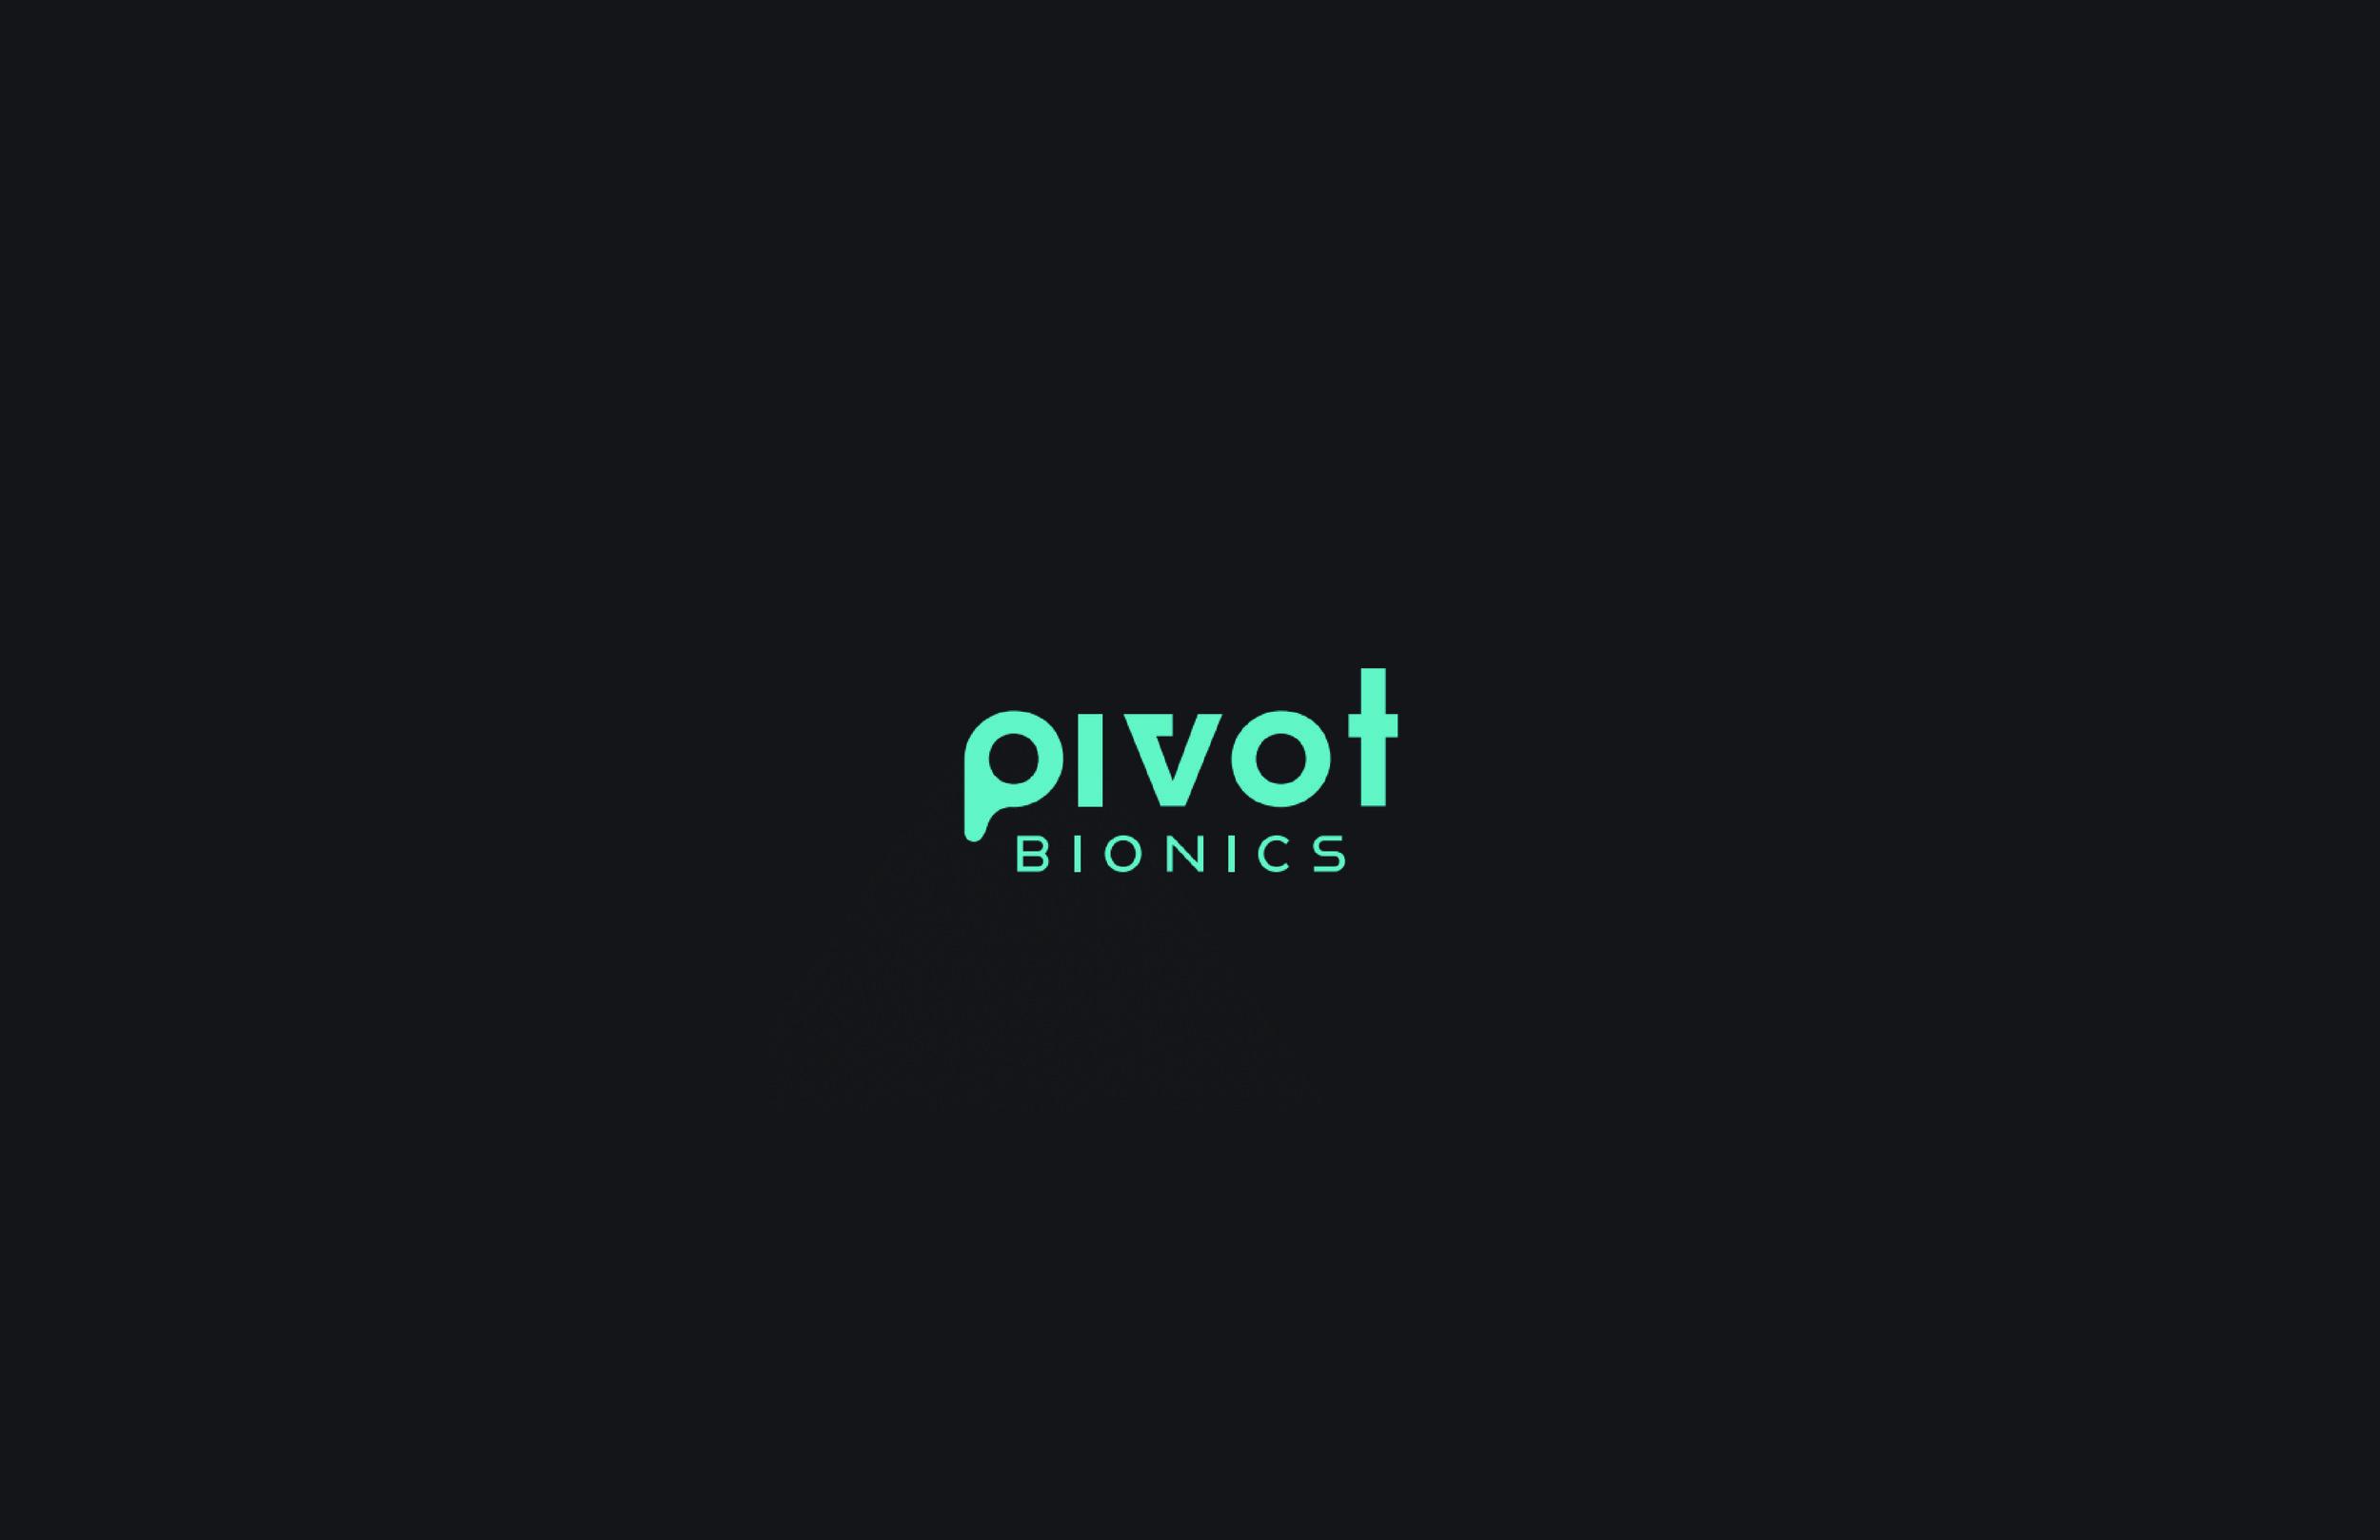 pivotbionics_web.jpg